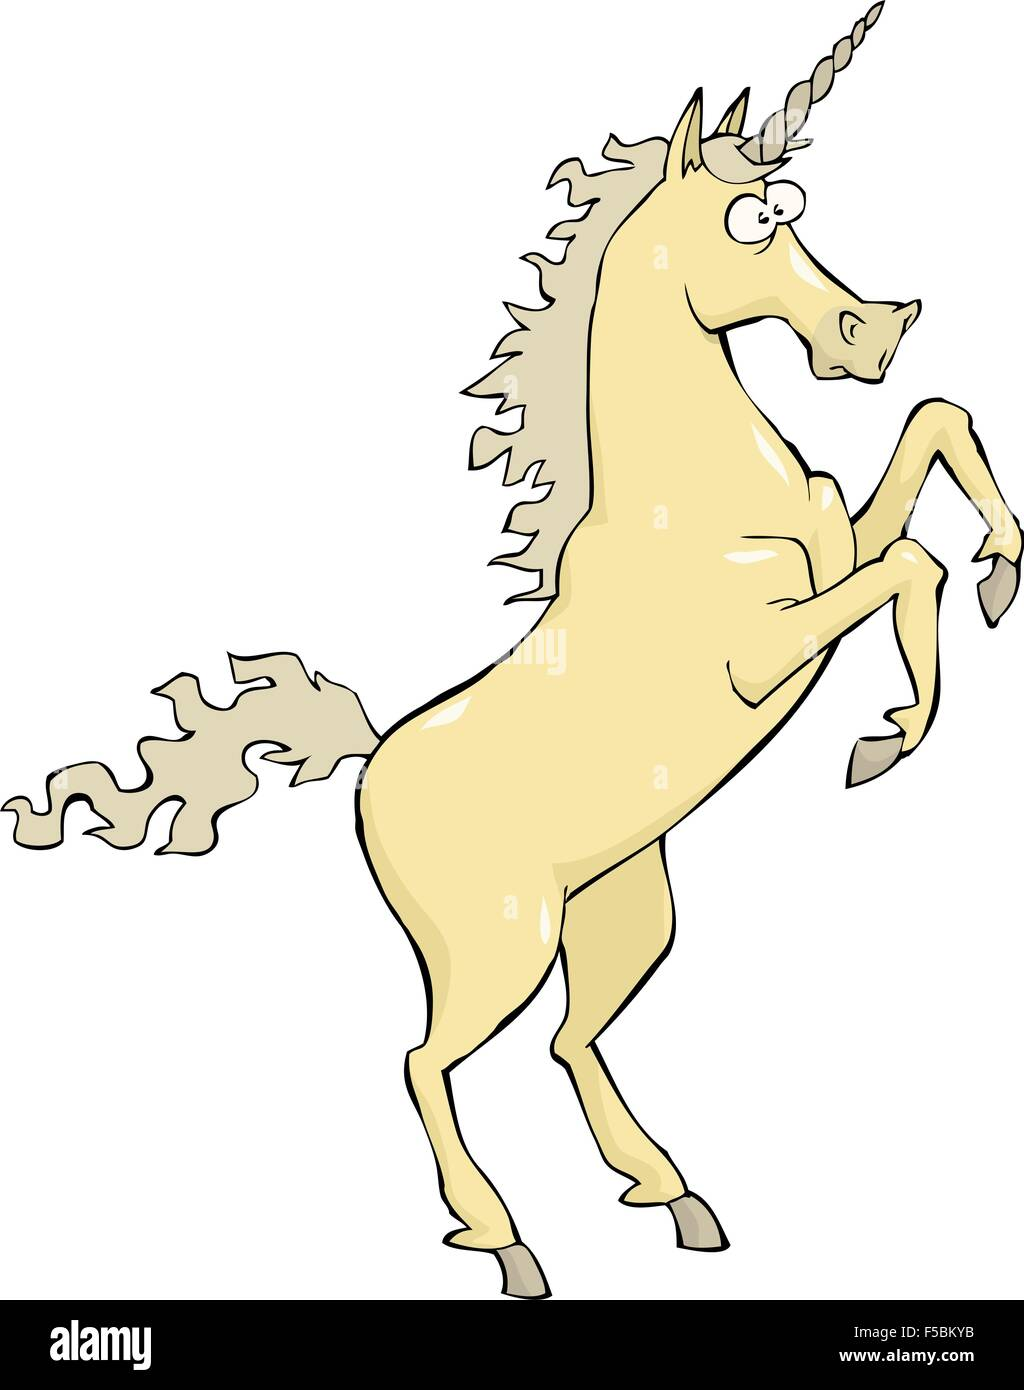 Unicorn on a white background vector illustration - Stock Vector